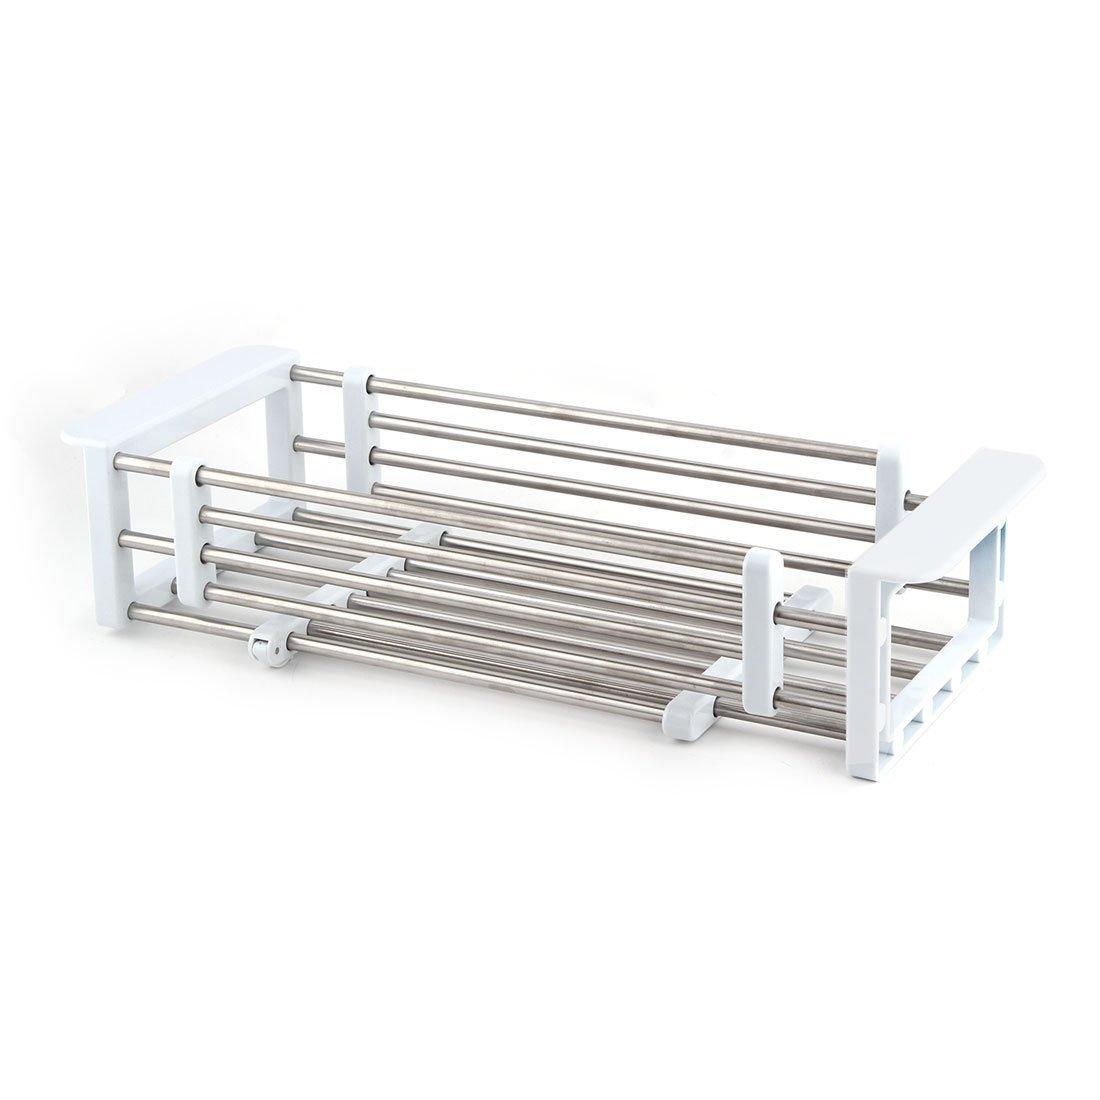 Amazon.com: DealMux metal Cozinha telescópico Dish drenagem rack Sink Bandeja Colander Secagem Titular Branco tom de prata: Kitchen & Dining